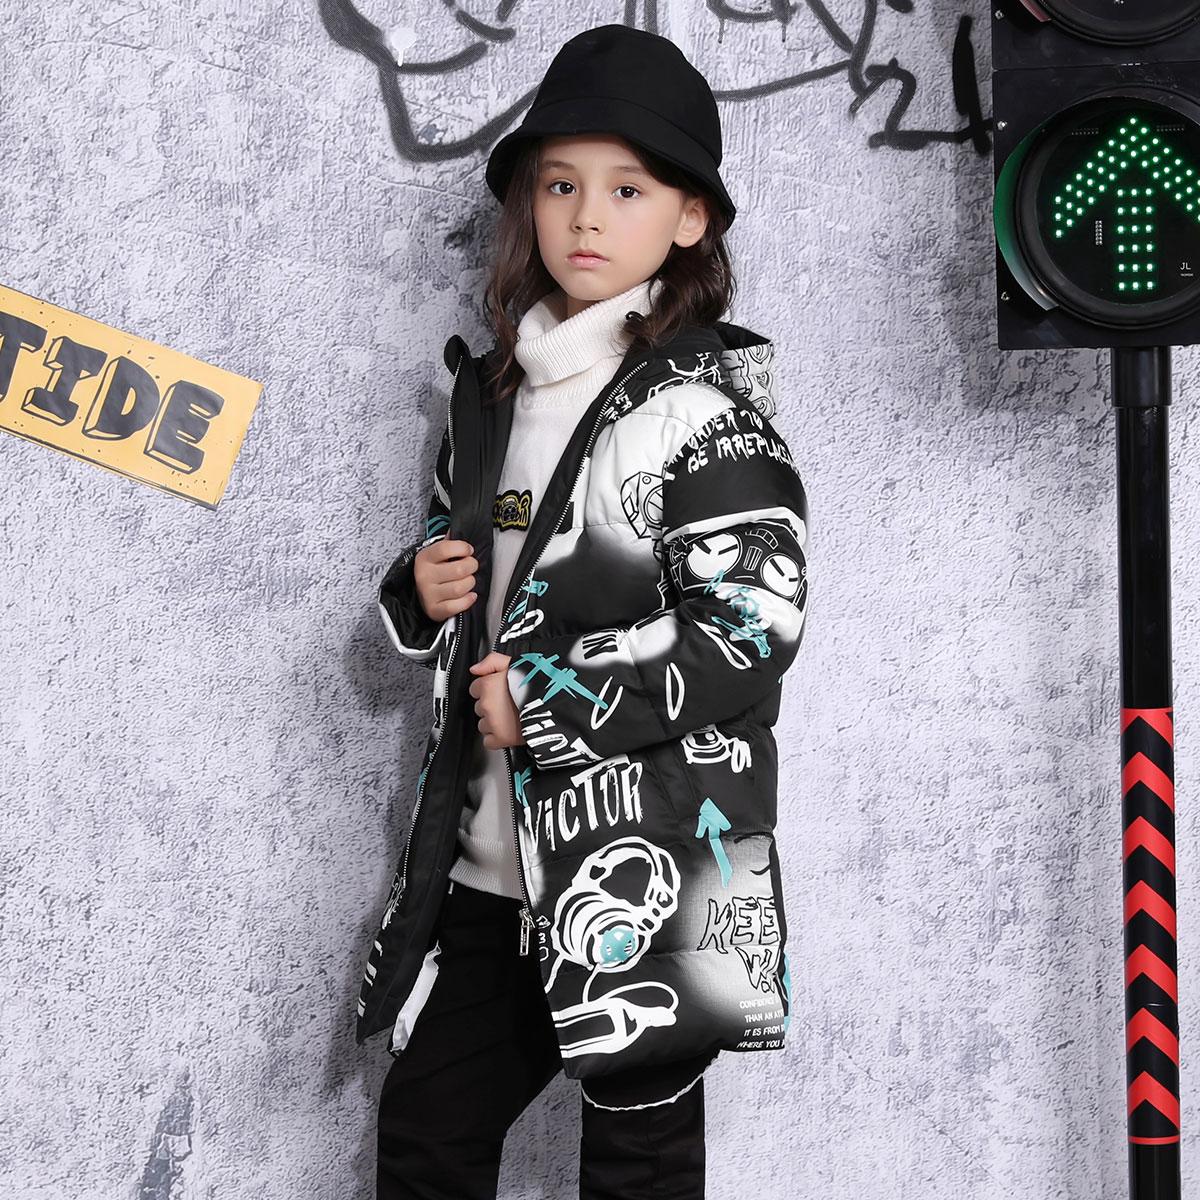 XXbin潮牌童装男童羽绒服儿童冬装洋气时髦连帽卡通中大童外套潮